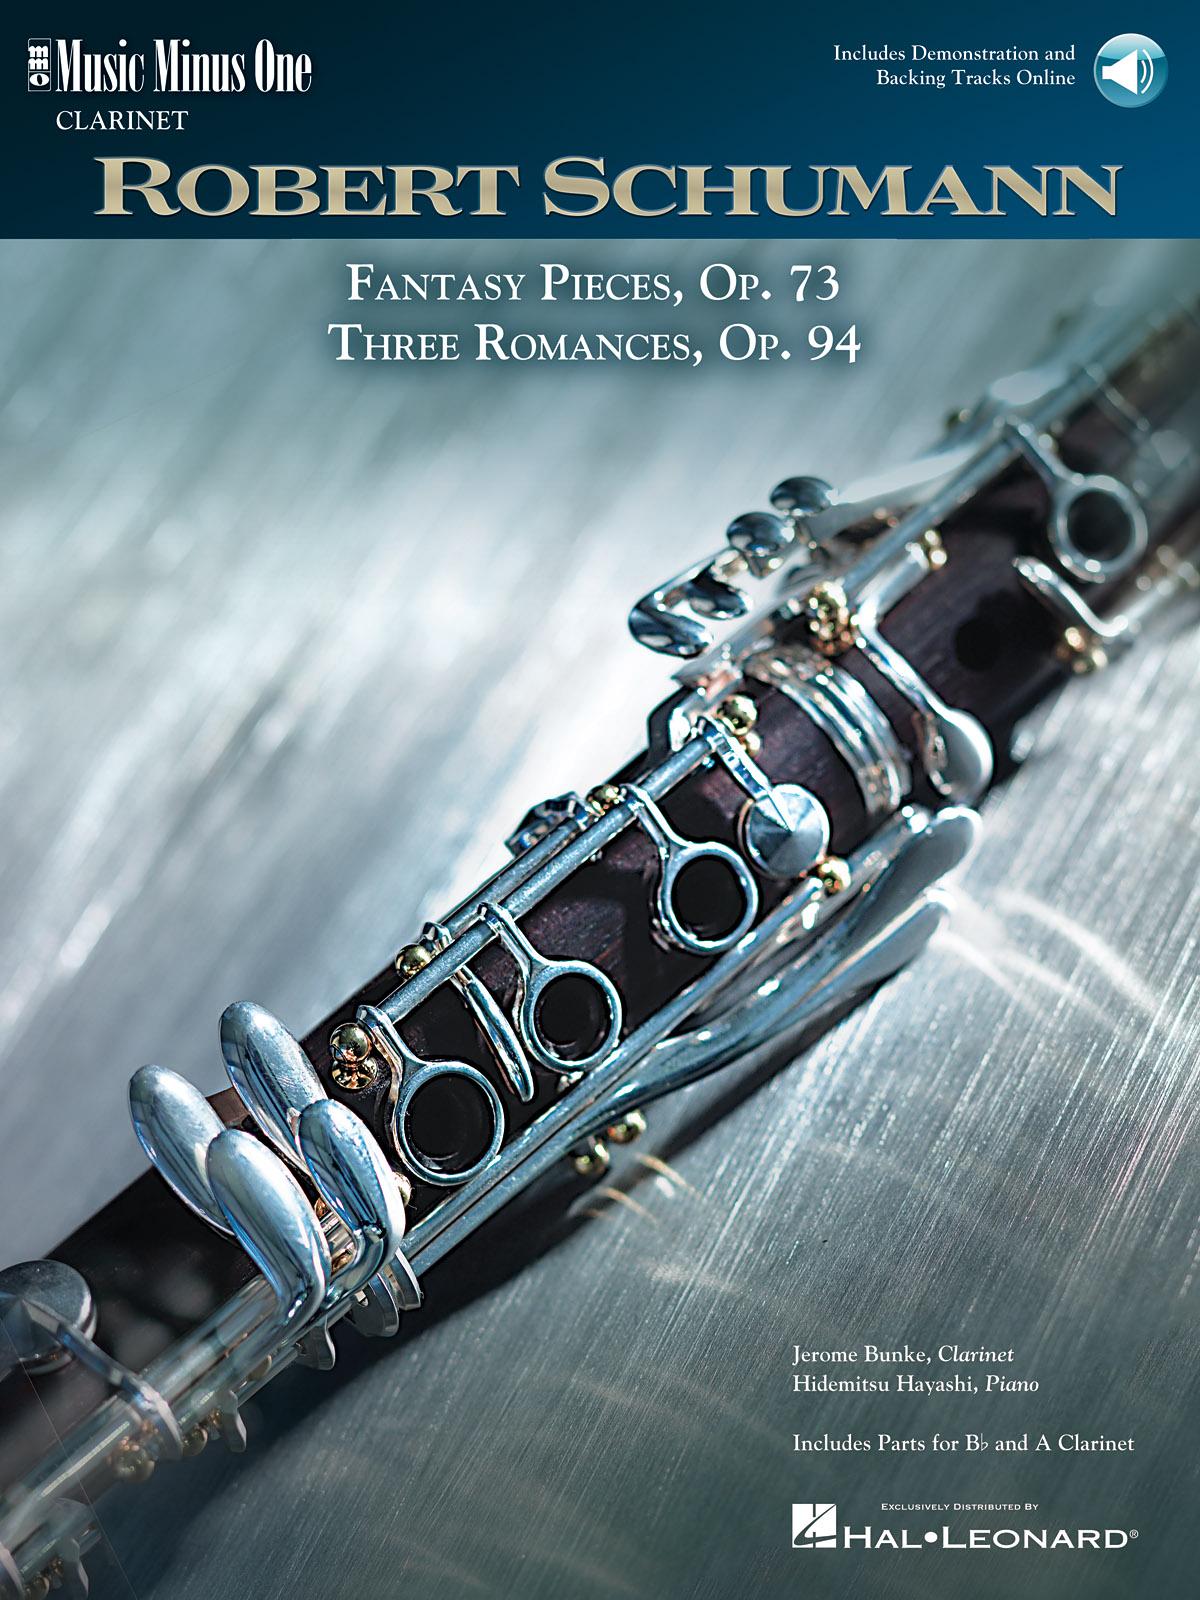 Schumann: 5 Fantasy Pieces  Op. 73 and 3 Romances  Op. 94: Clarinet Solo